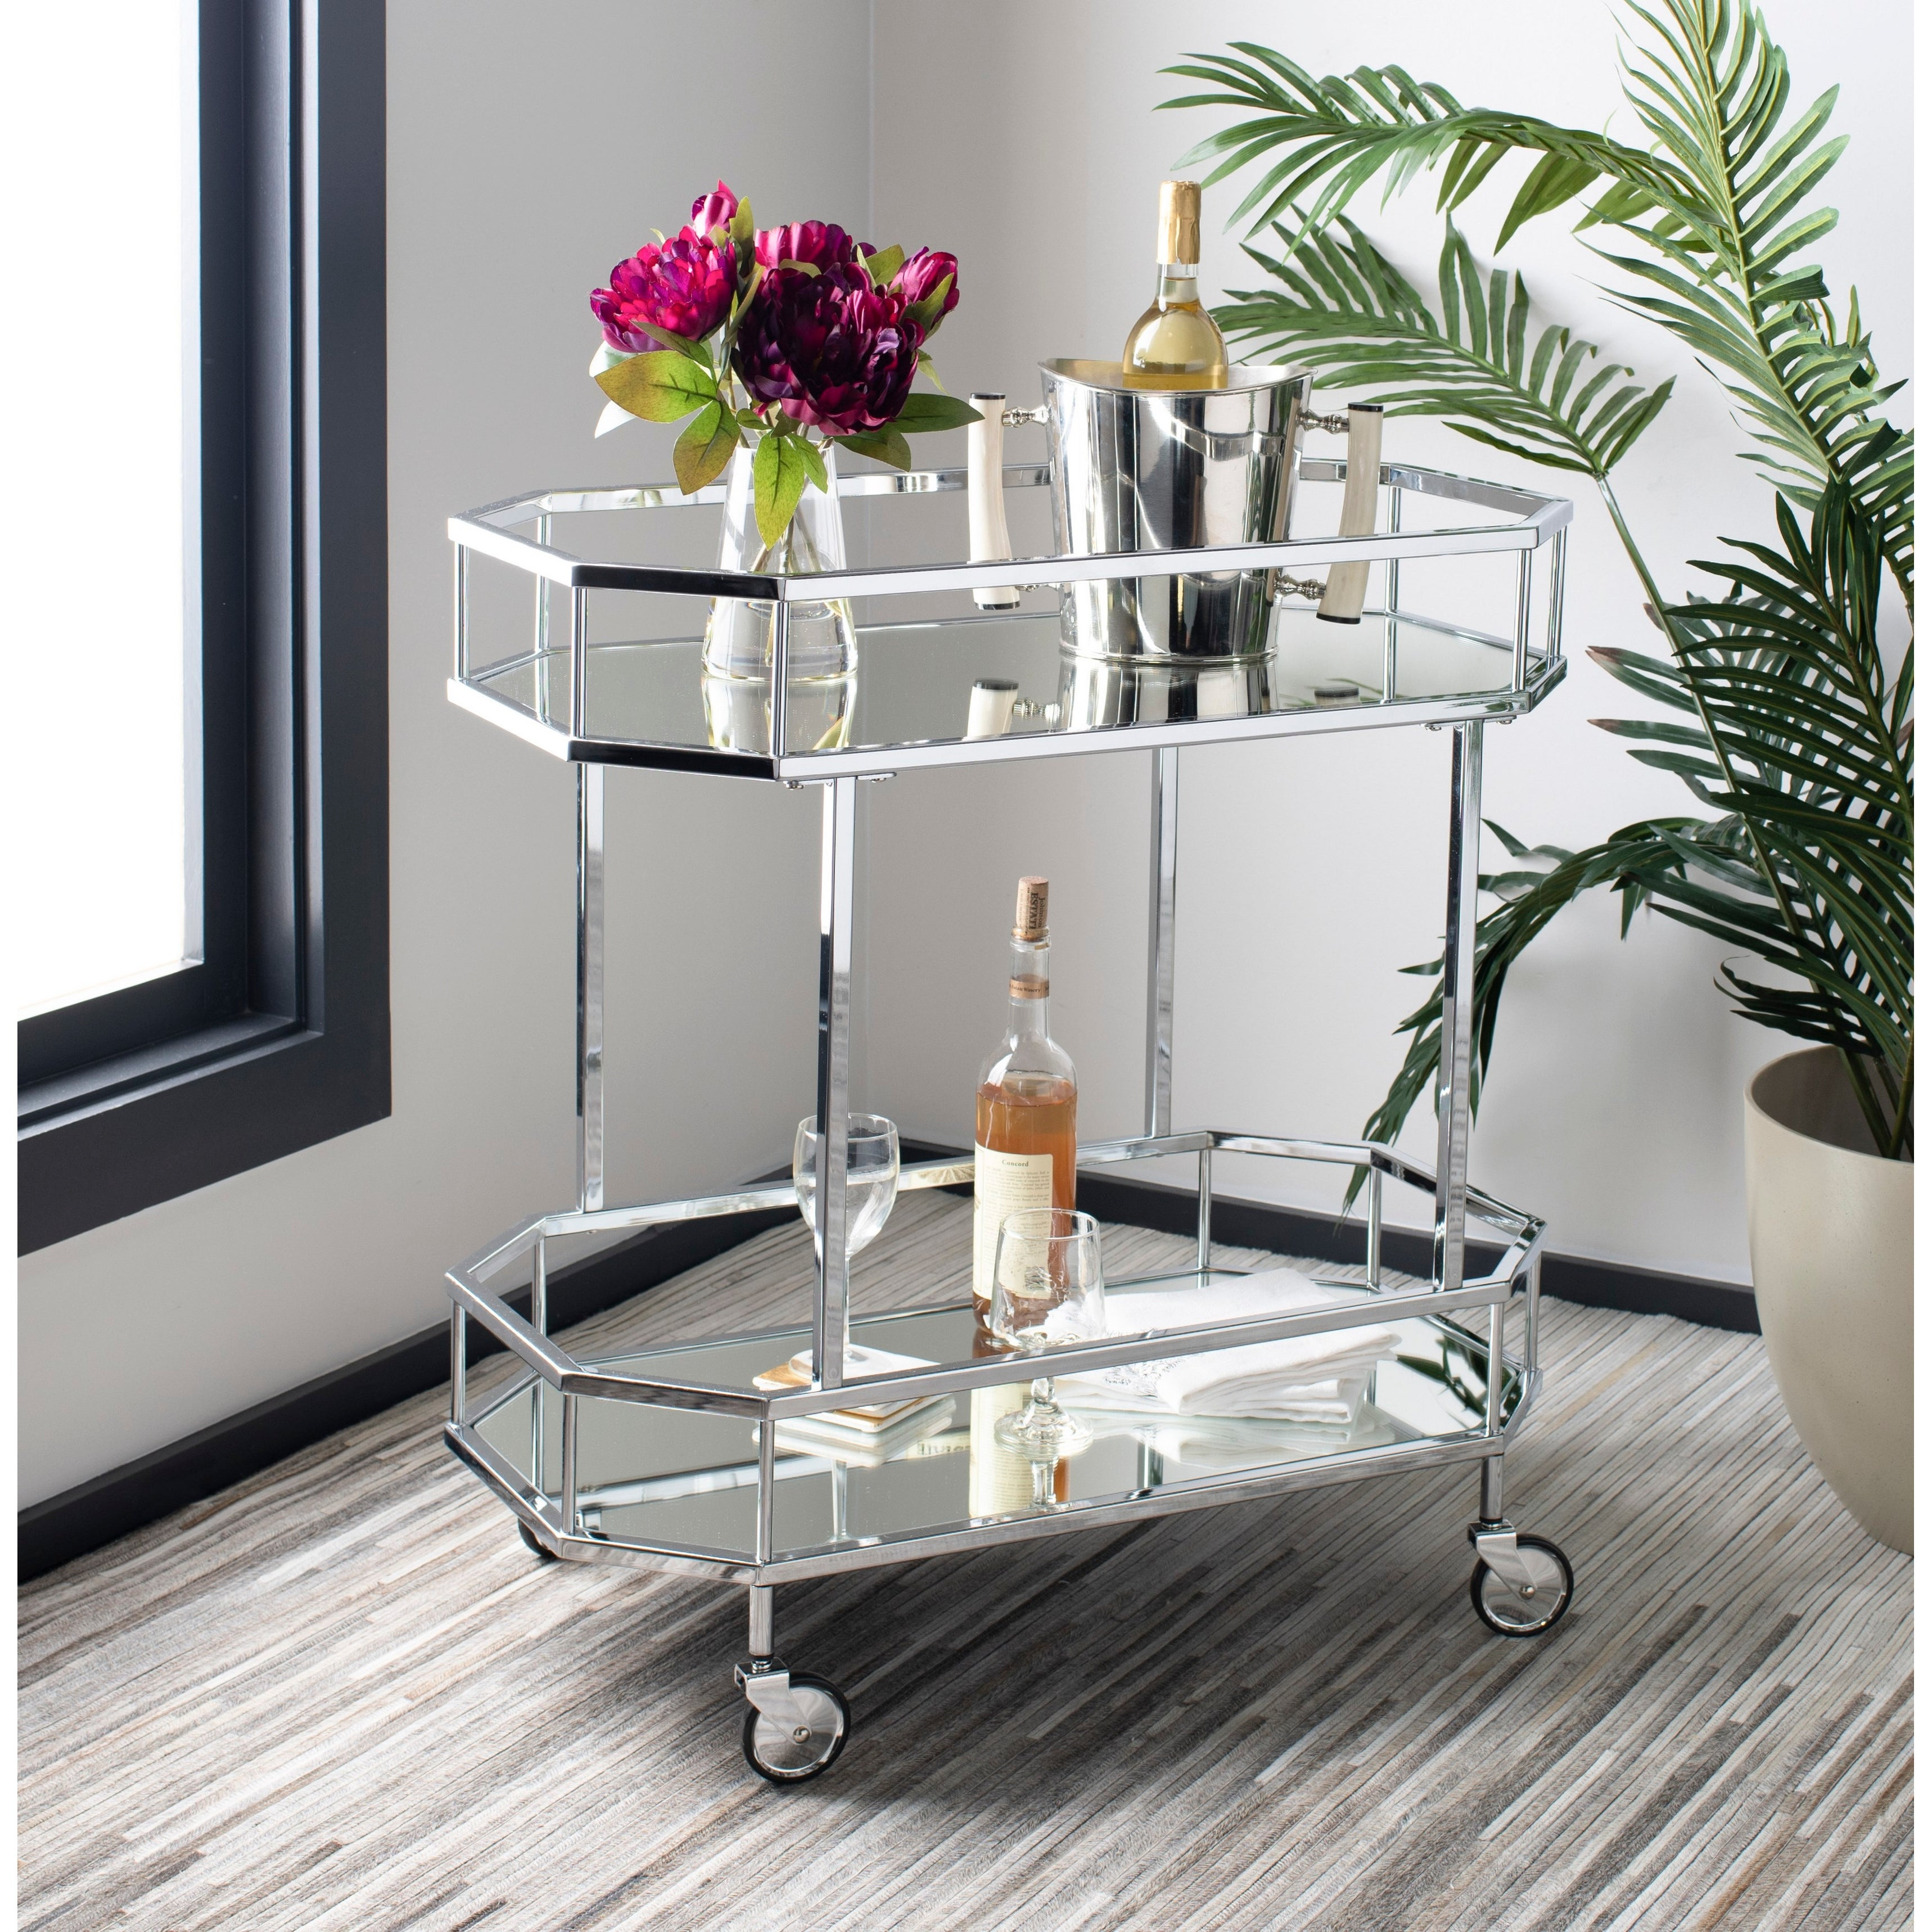 Safavieh Silva 2 Tier Octagon Bar Cart Silver Mirror 29 6 X 16 5 X 29 8 29 6 X 16 5 X 29 8 On Sale Overstock 23591321